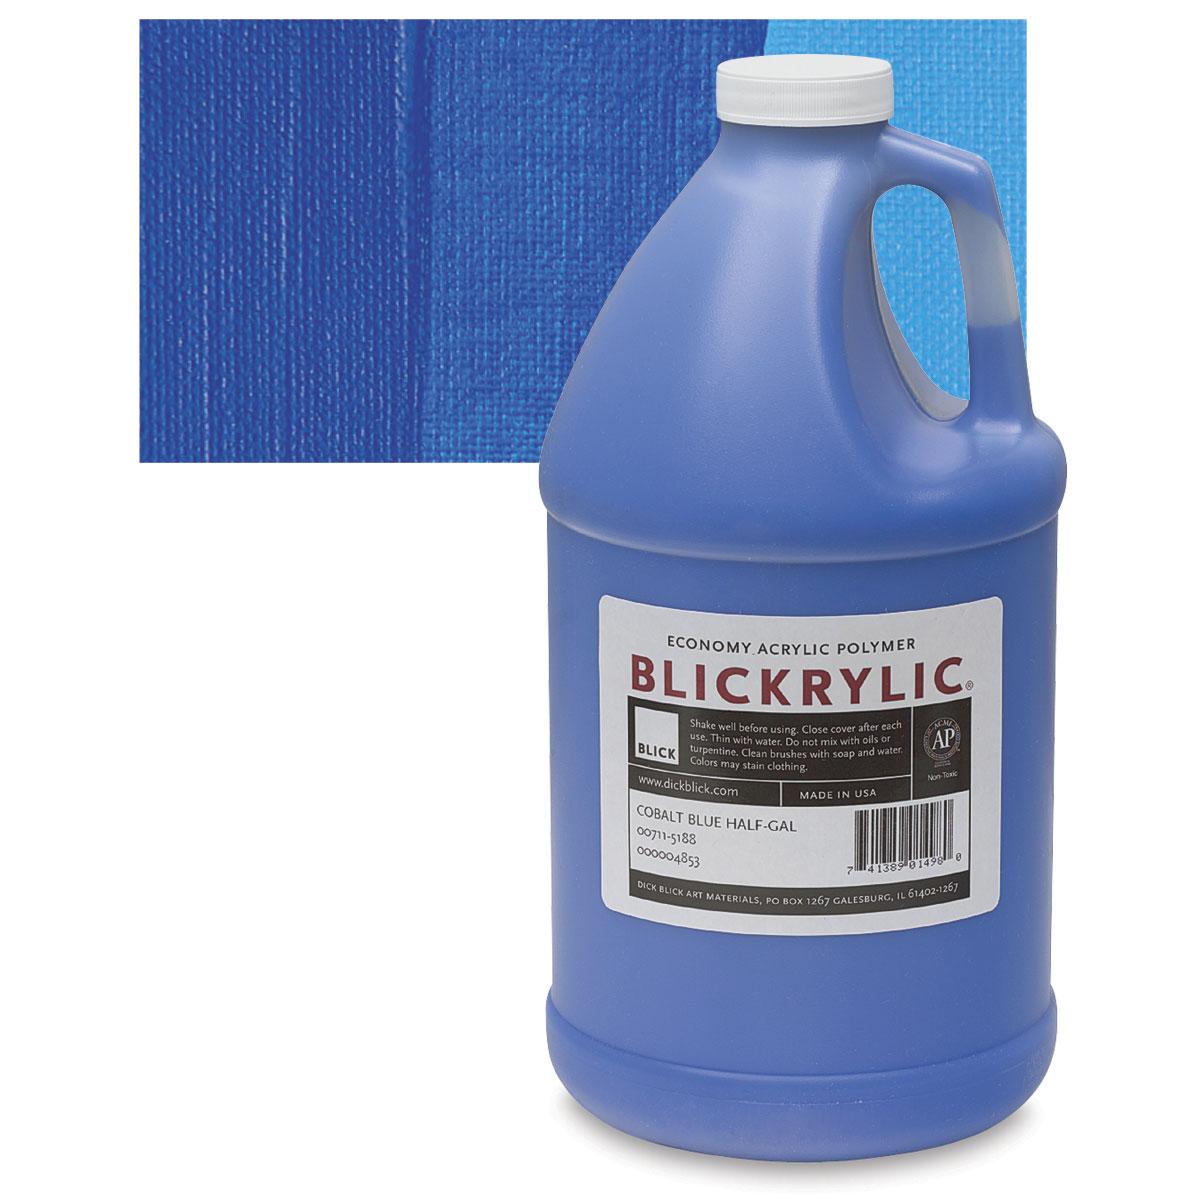 007115188 blickrylic student acrylics blick art materials